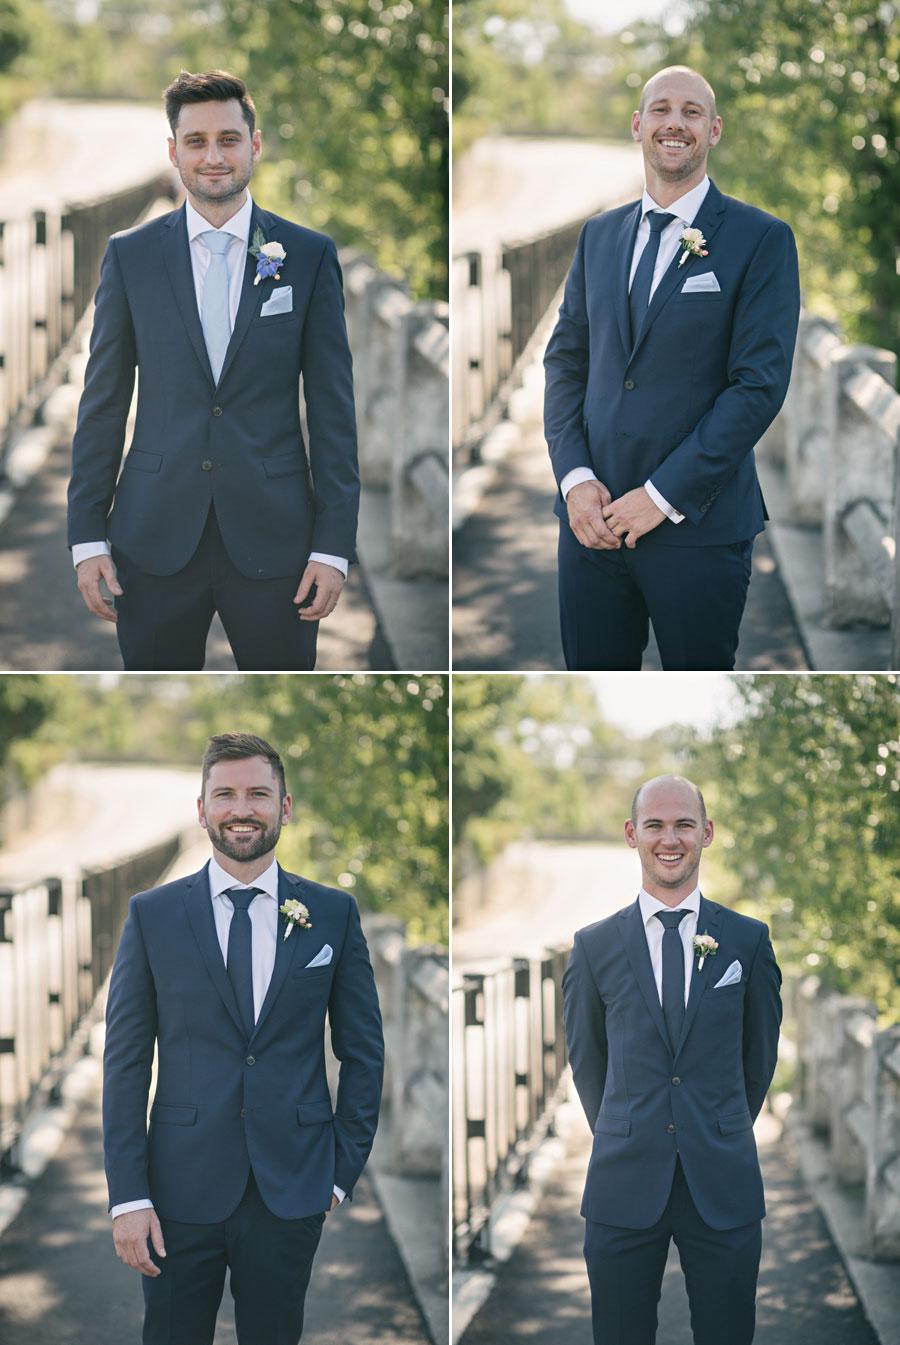 wedding-the-convent-dayelsford-victoria-louise-giles-042.jpg